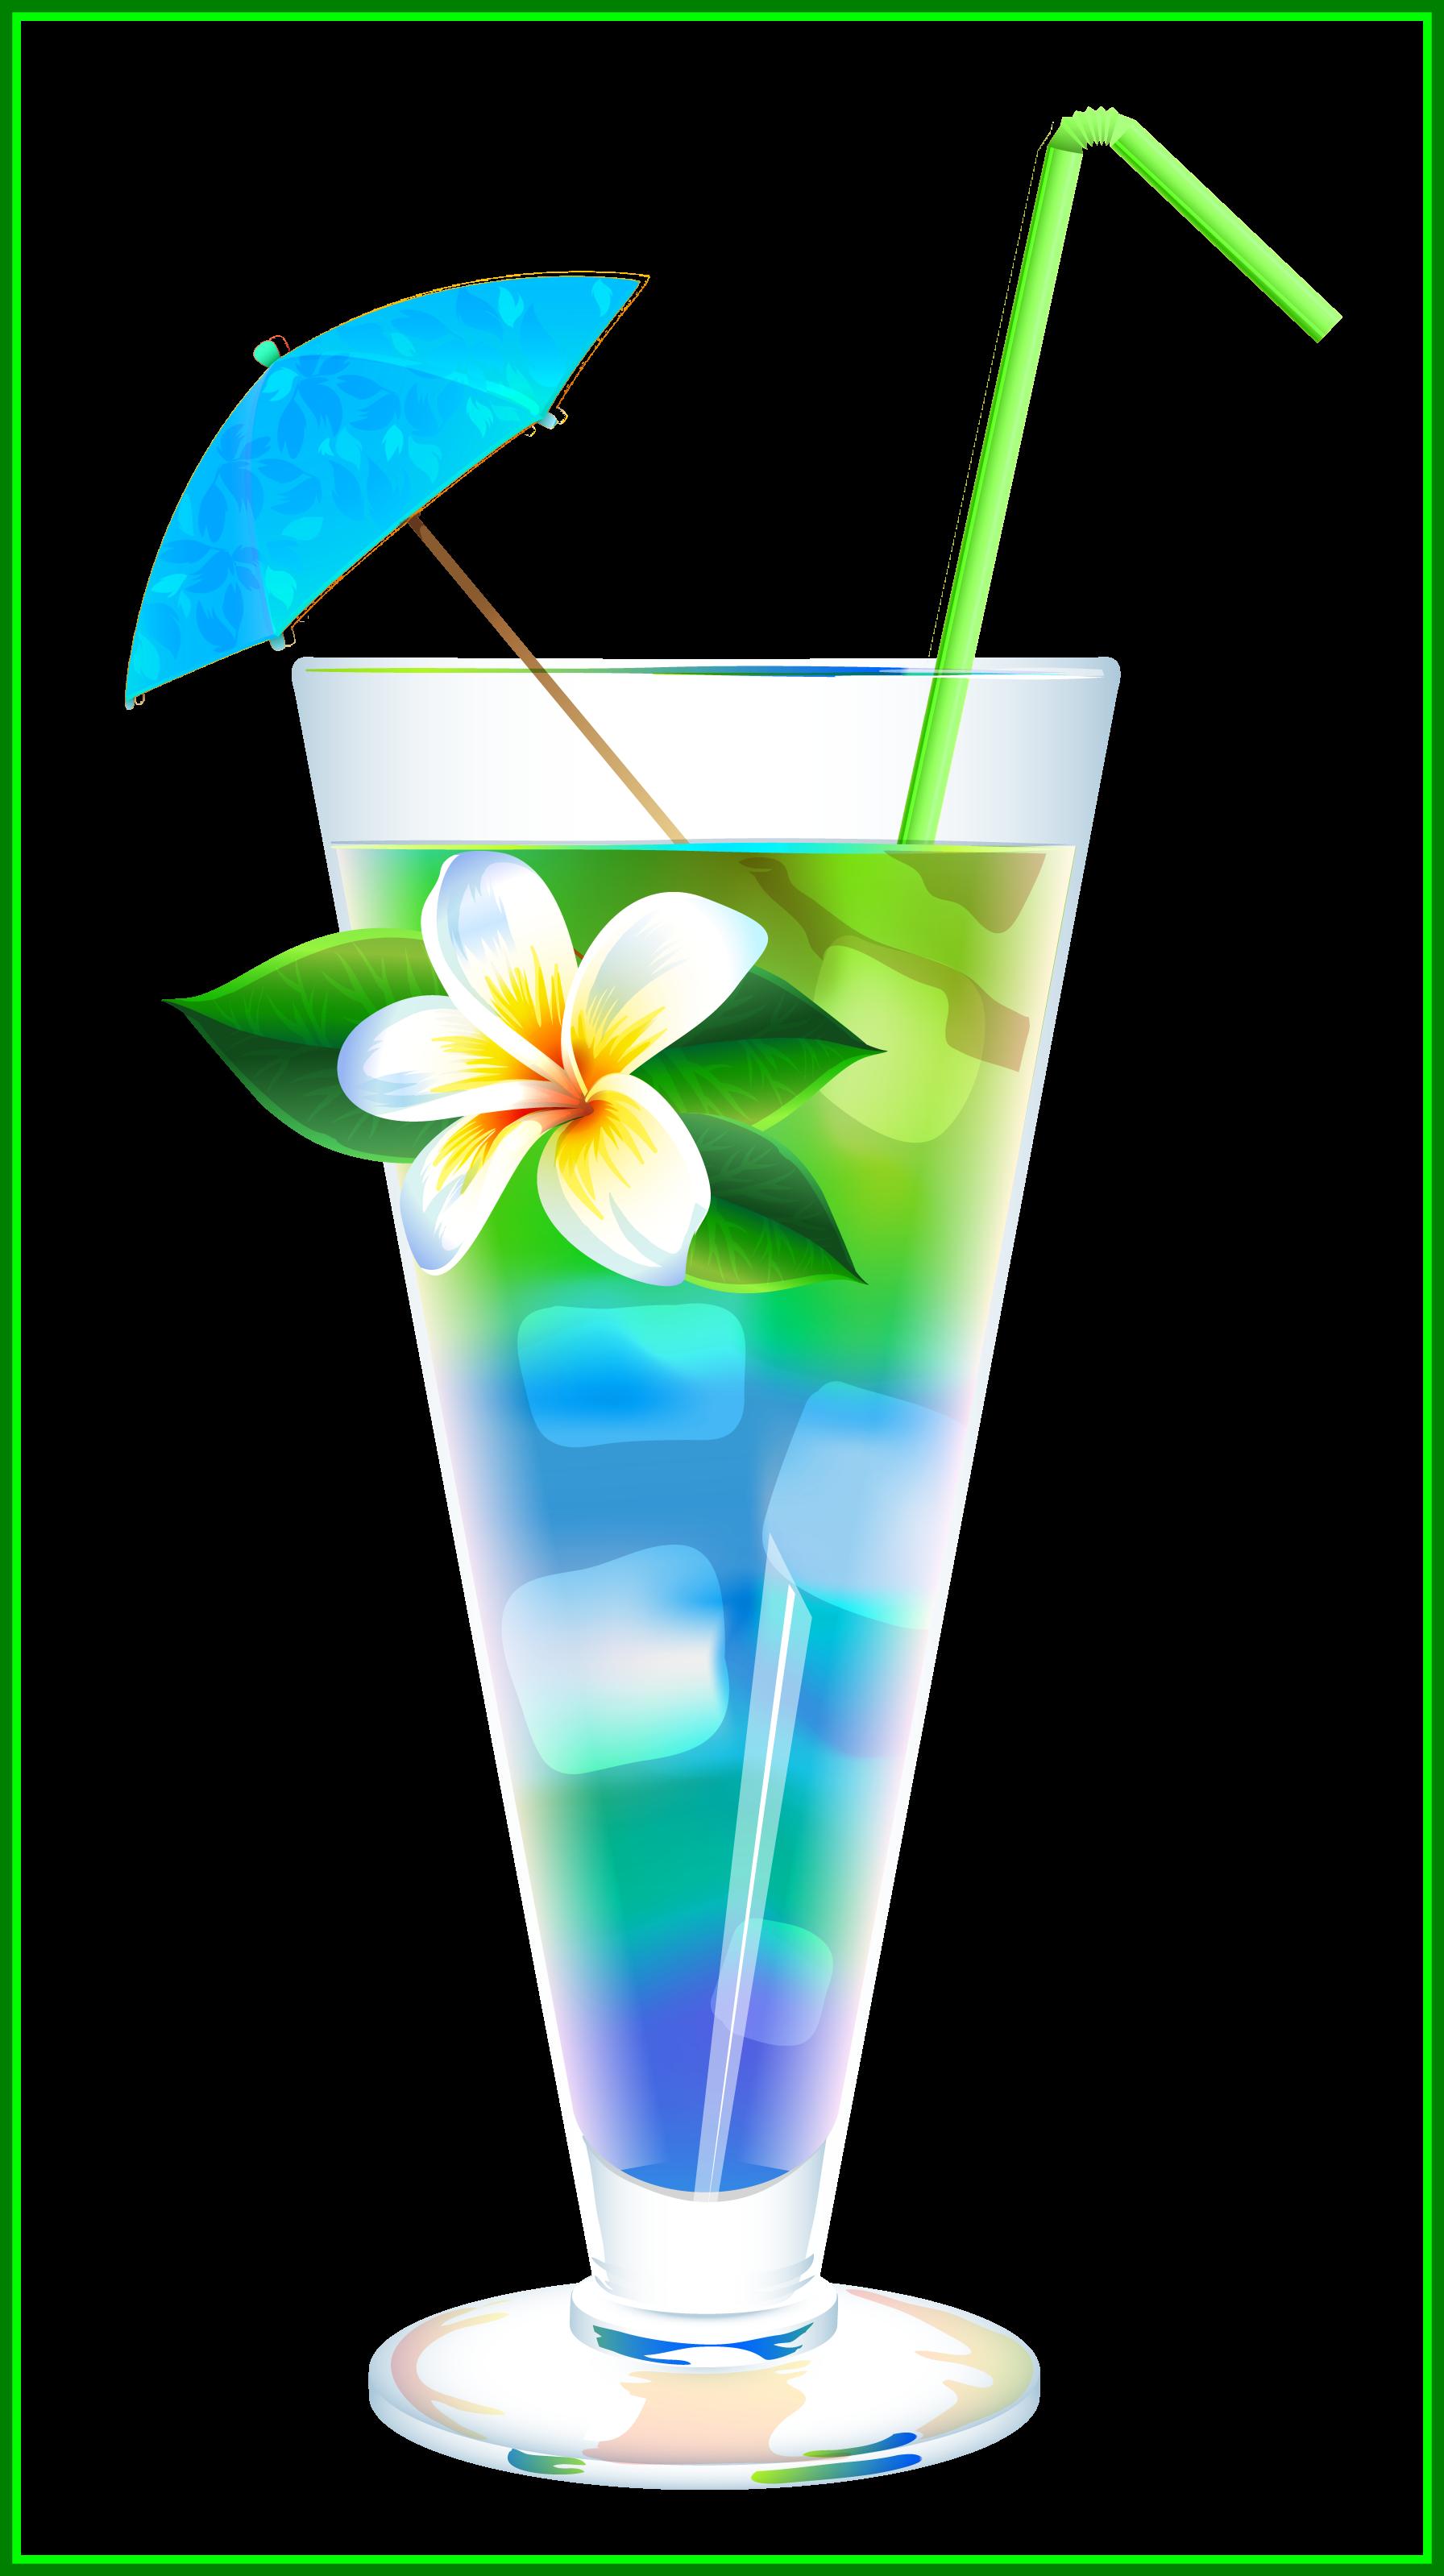 drinks clipart straw